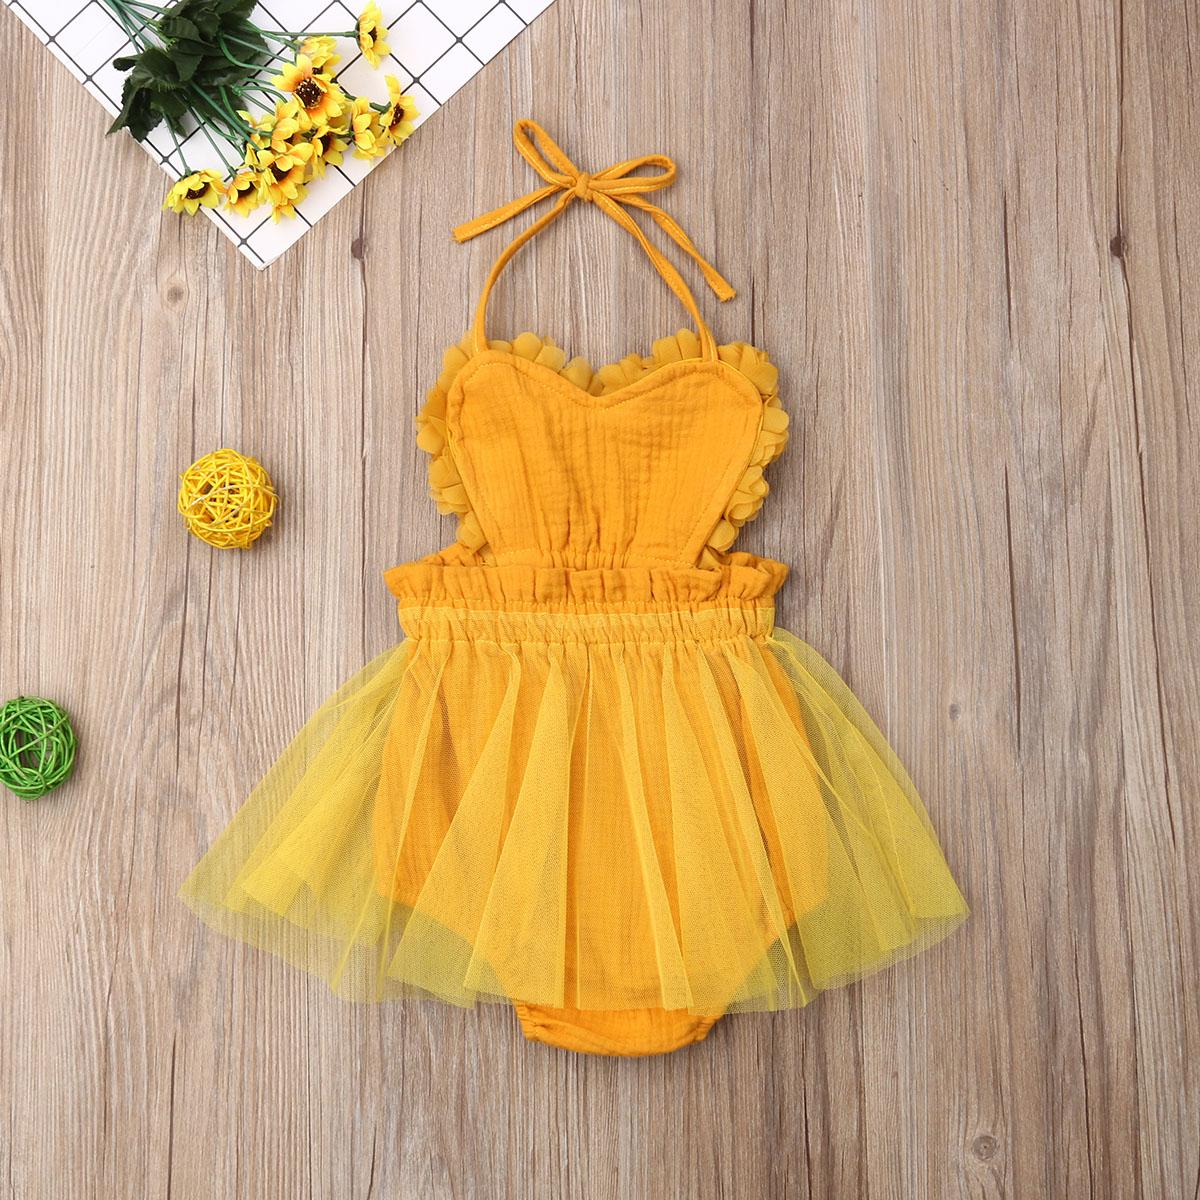 2020 New Cute Baby Girl Bodysuit Dress Halter Lace-up Lace Sundress Summer Baby Girl Sleeveless Backless Tulle Dress 0-18M